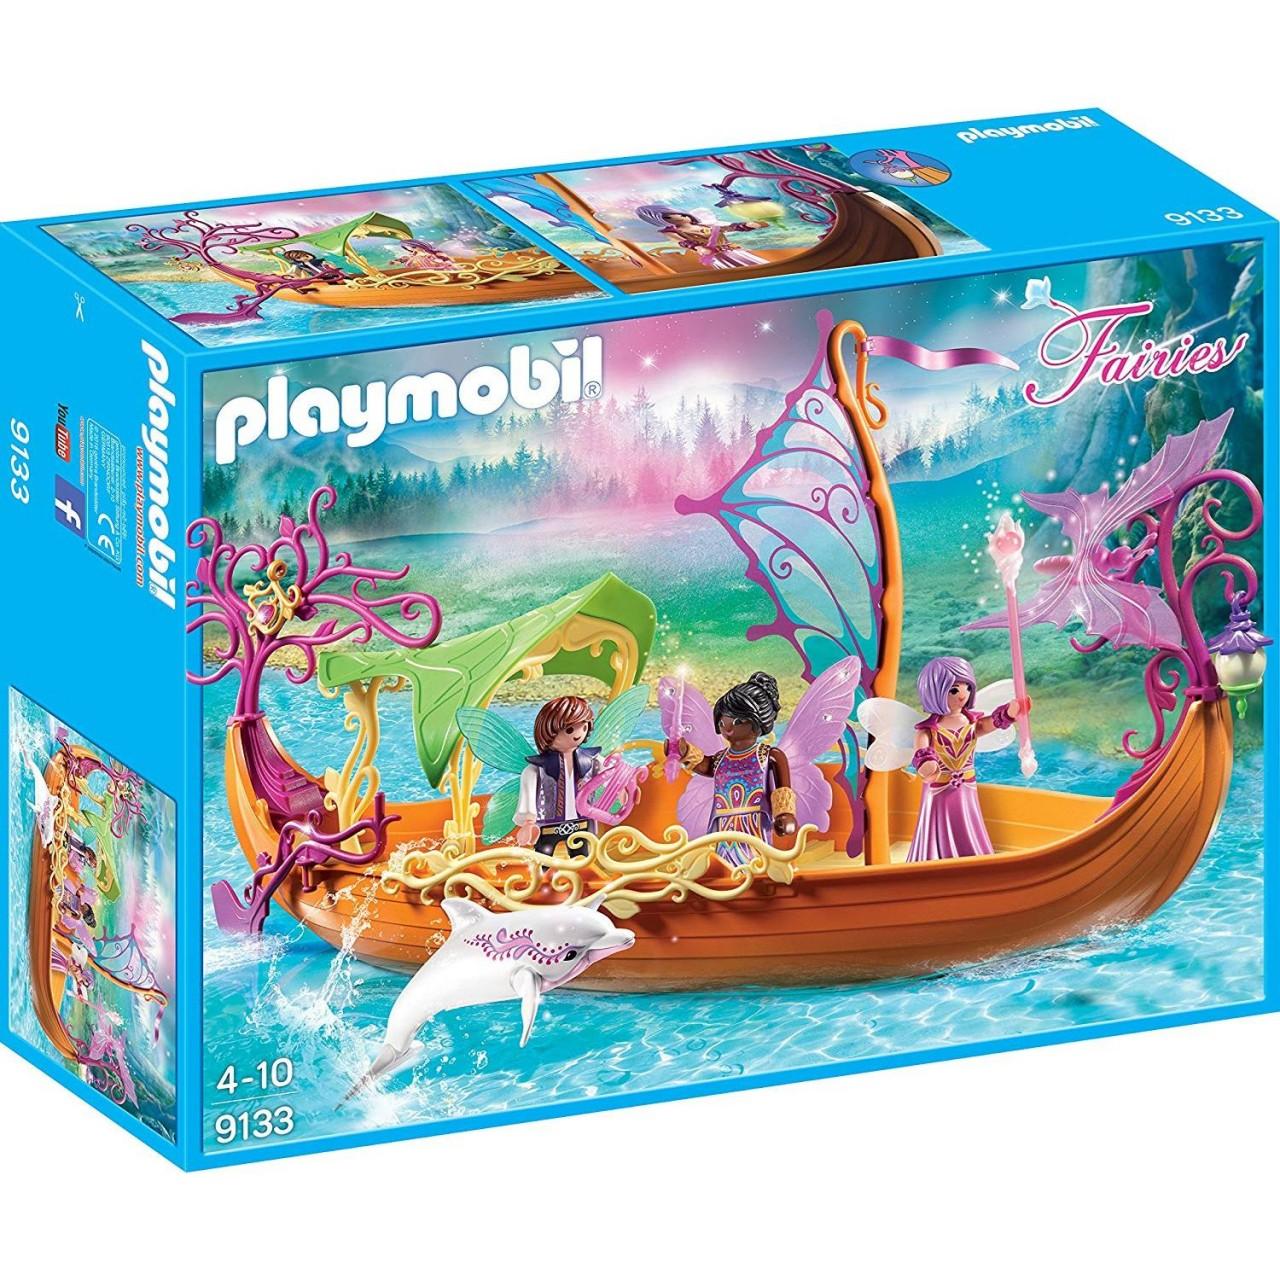 Playmobil 9133 Romantisches Feenschiff